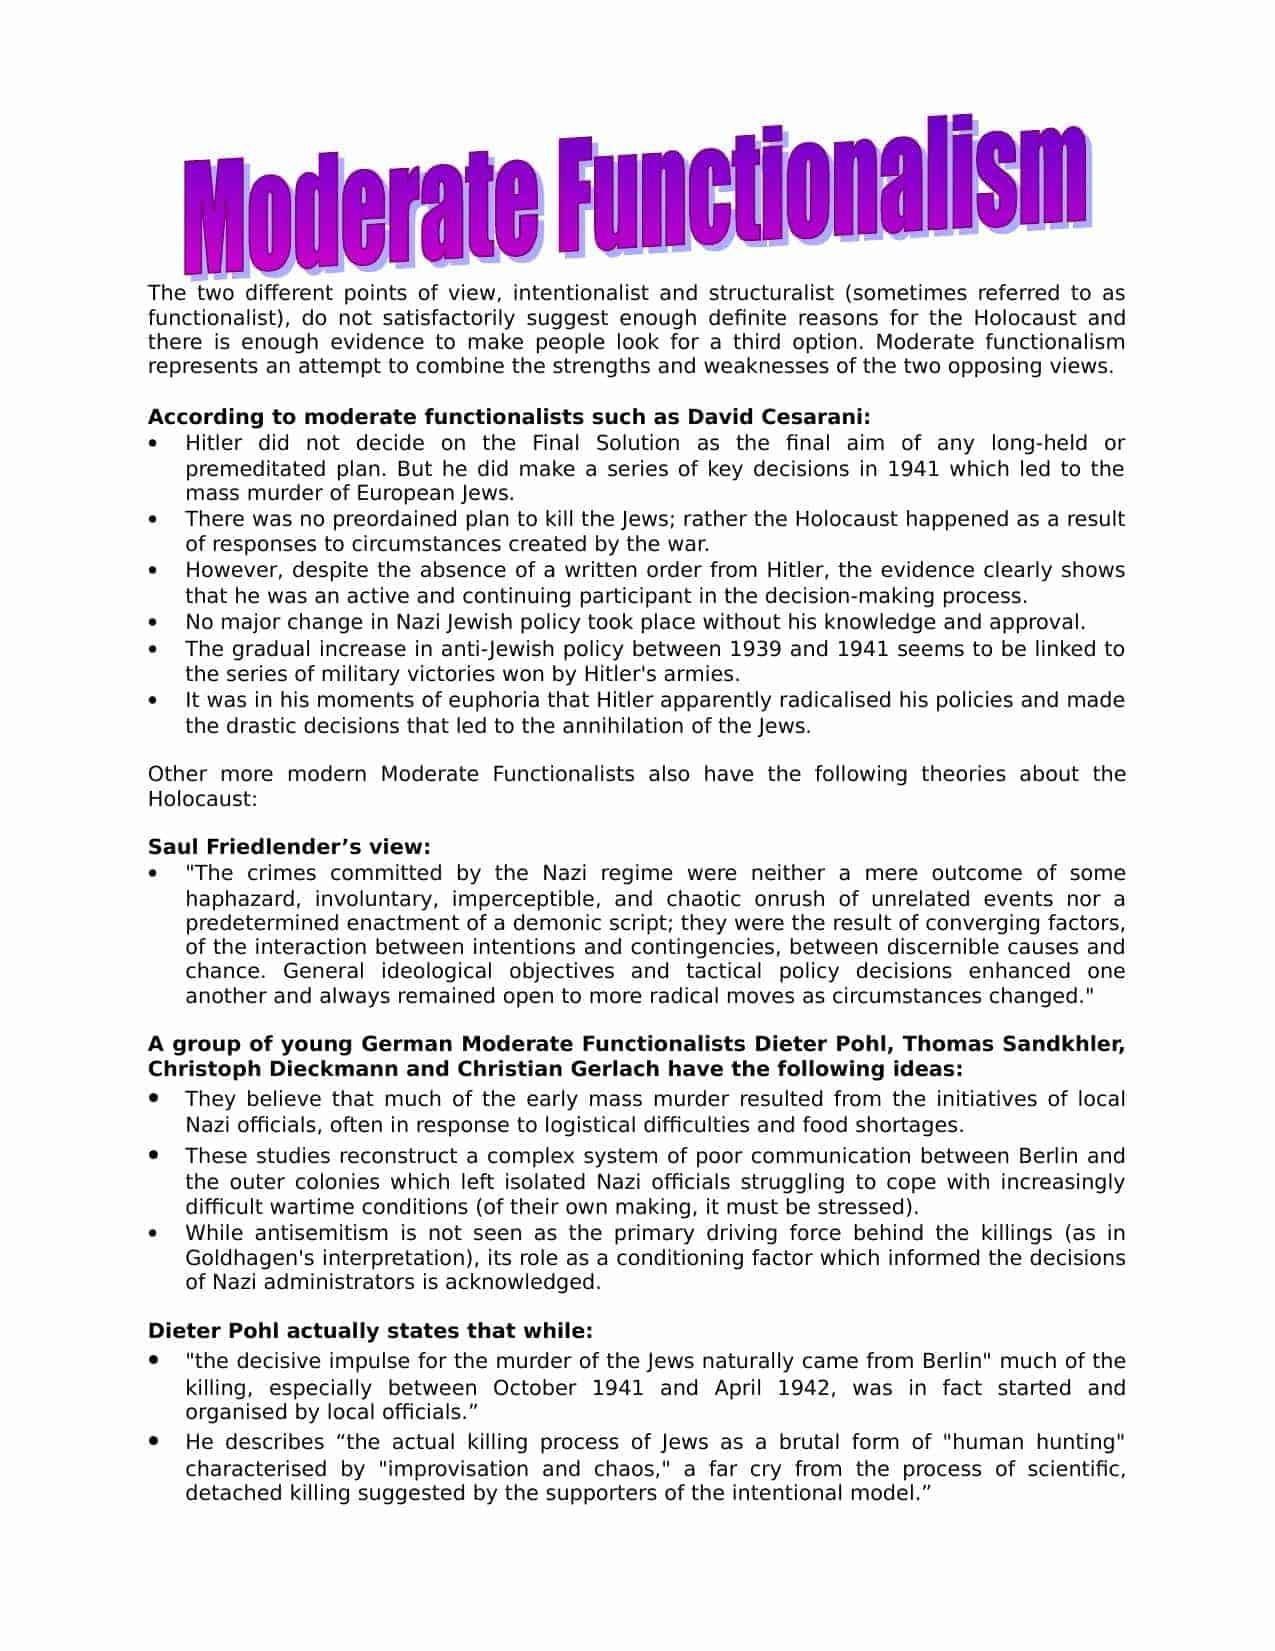 Moderate Functionalism On Nazi Germany